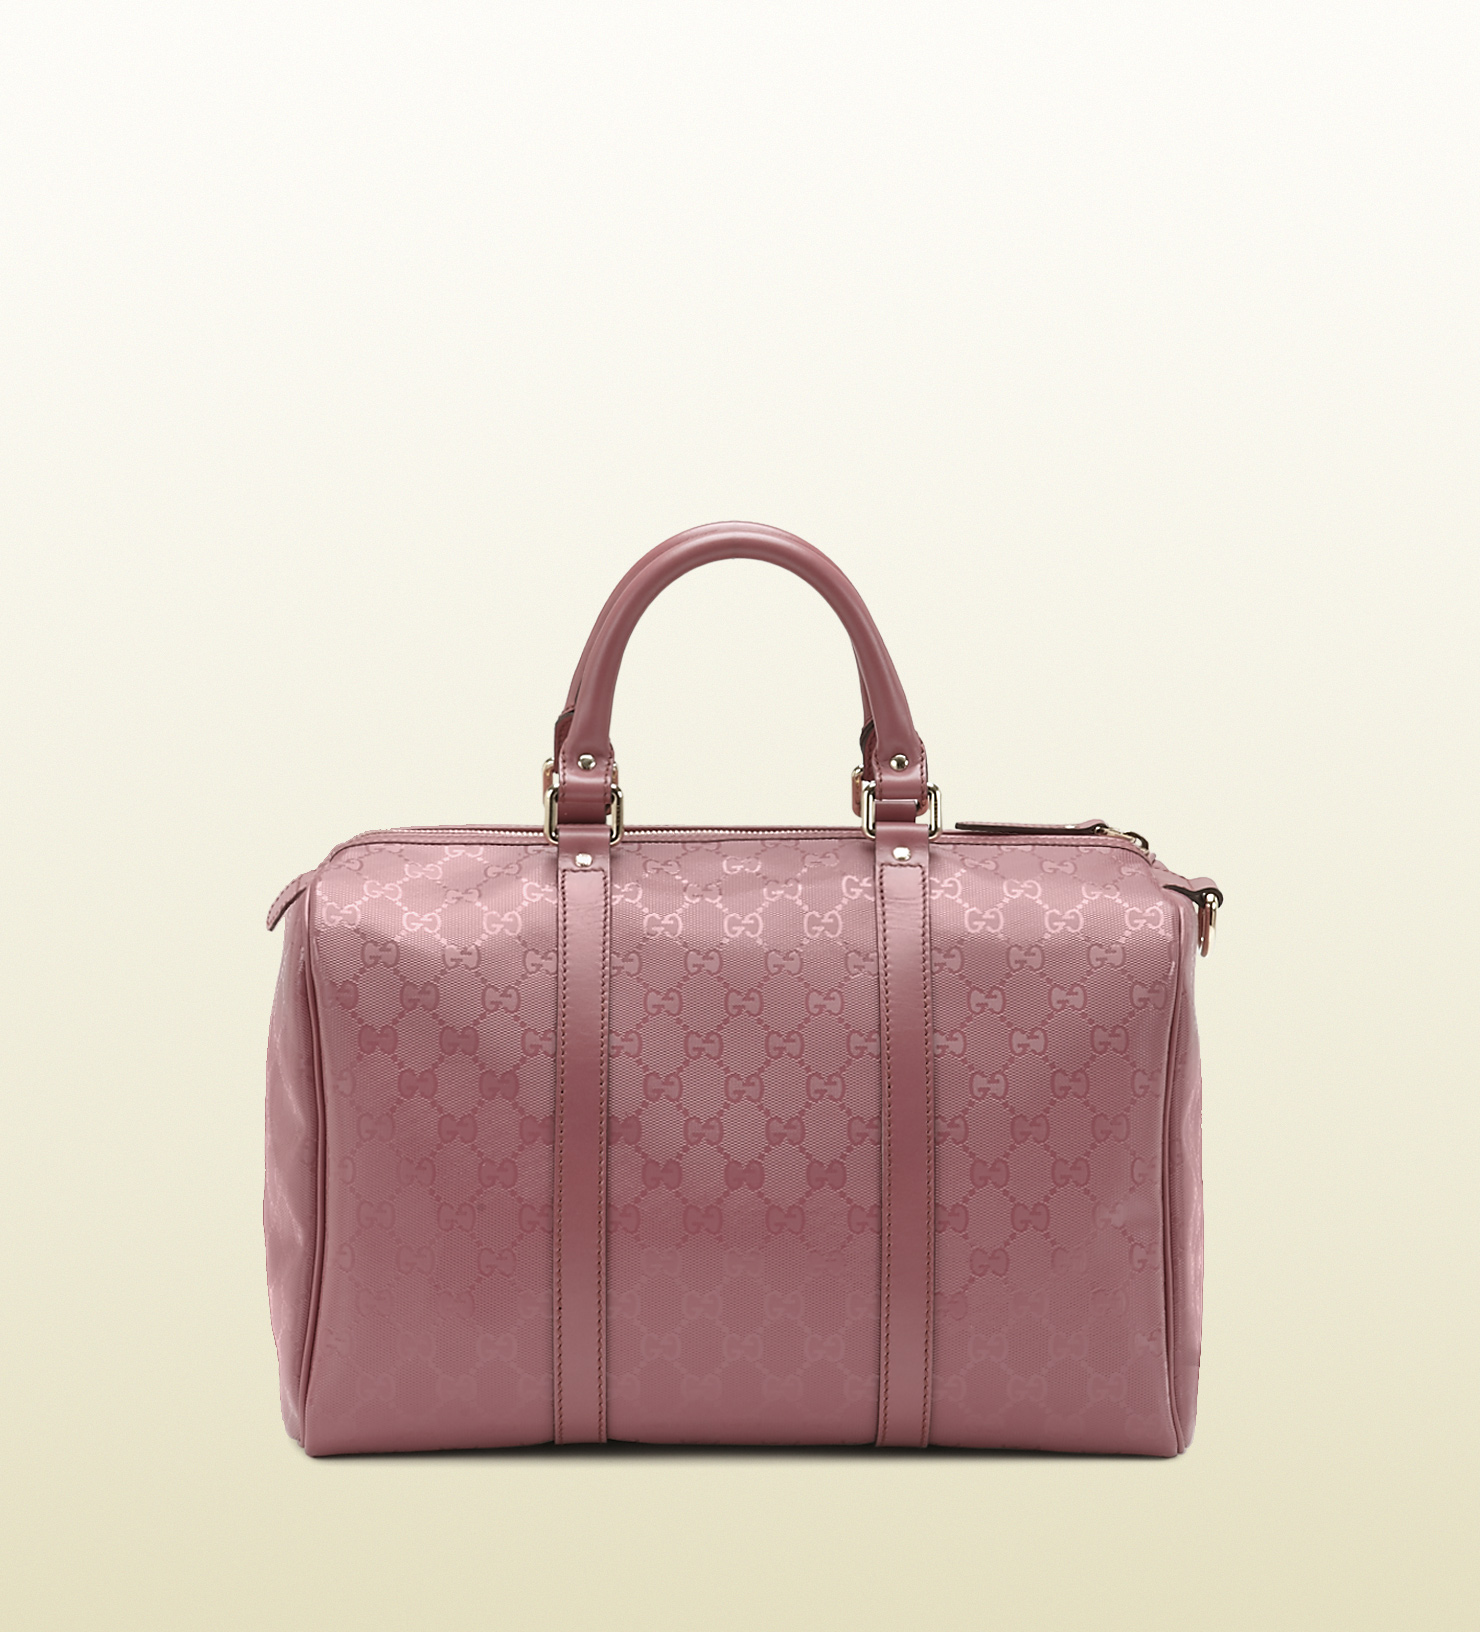 Lyst - Gucci Joy Dark Pink Gg Imprimé Boston Bag in Pink